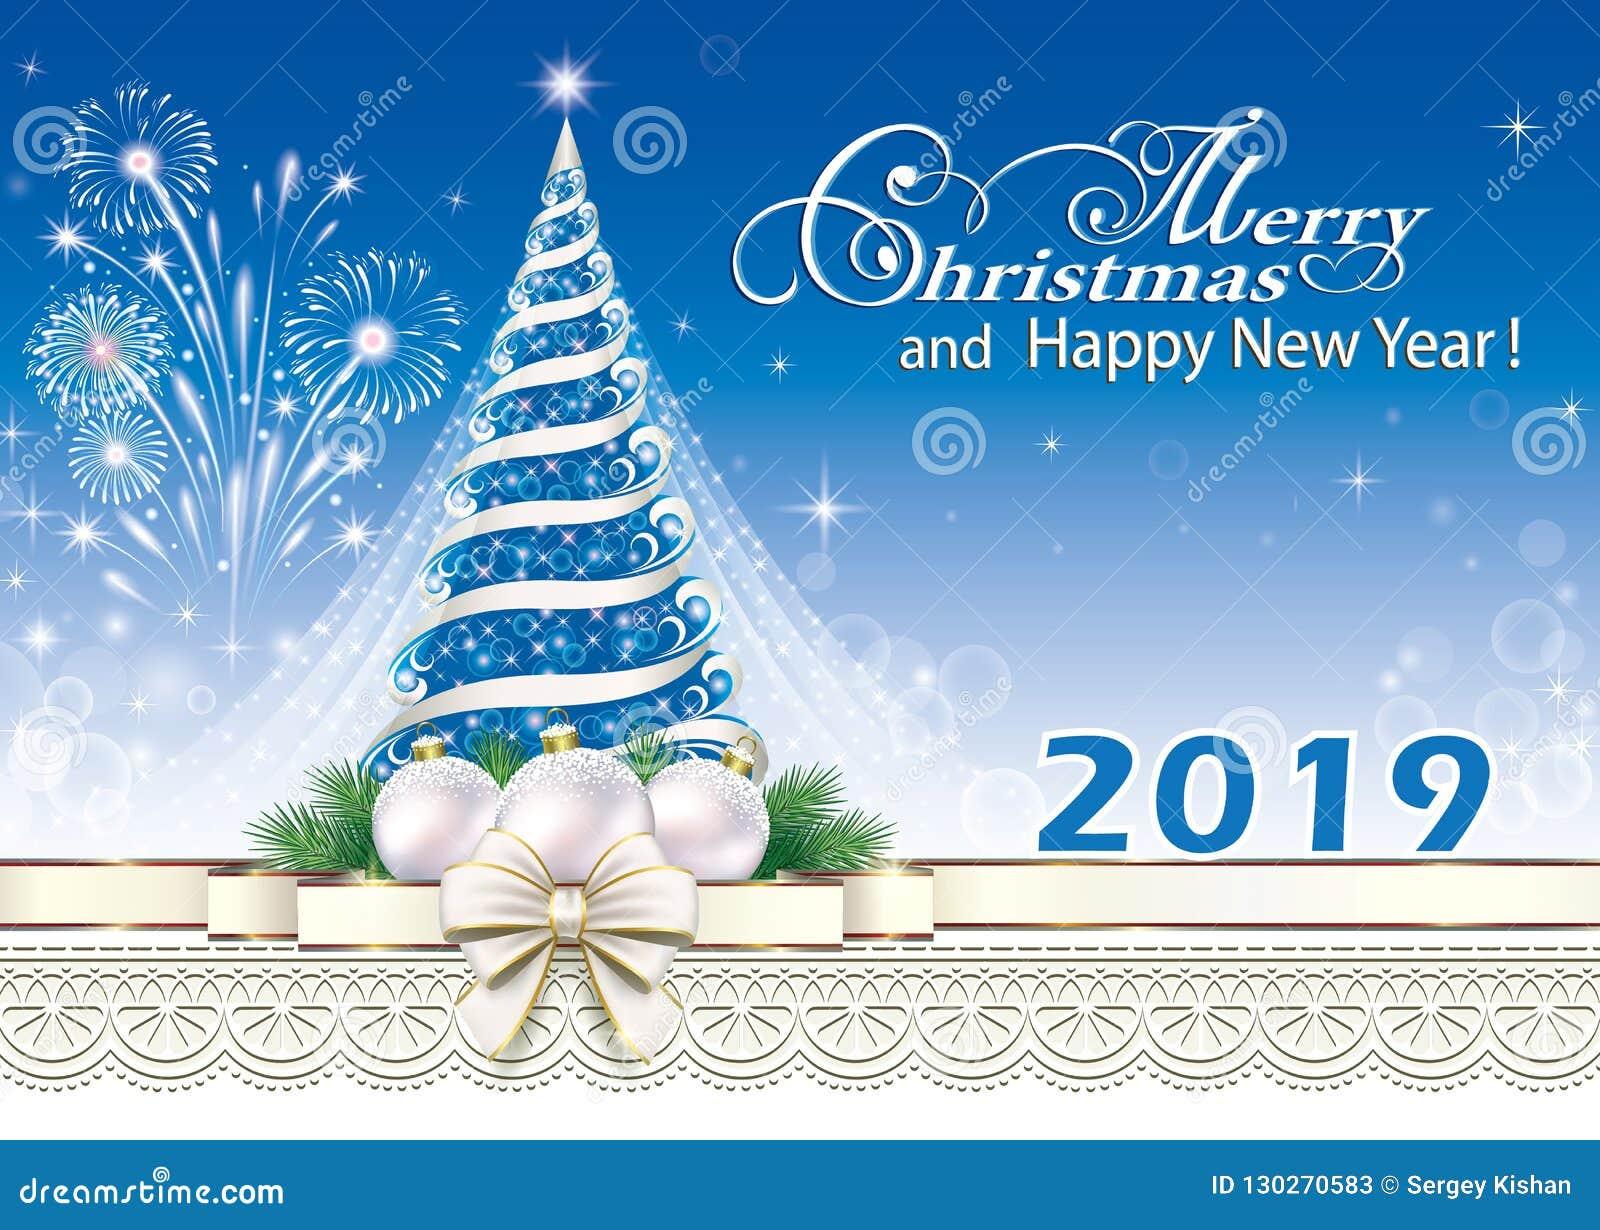 2019 Christmas.Happy New Year 2019 Christmas Tree Stock Vector